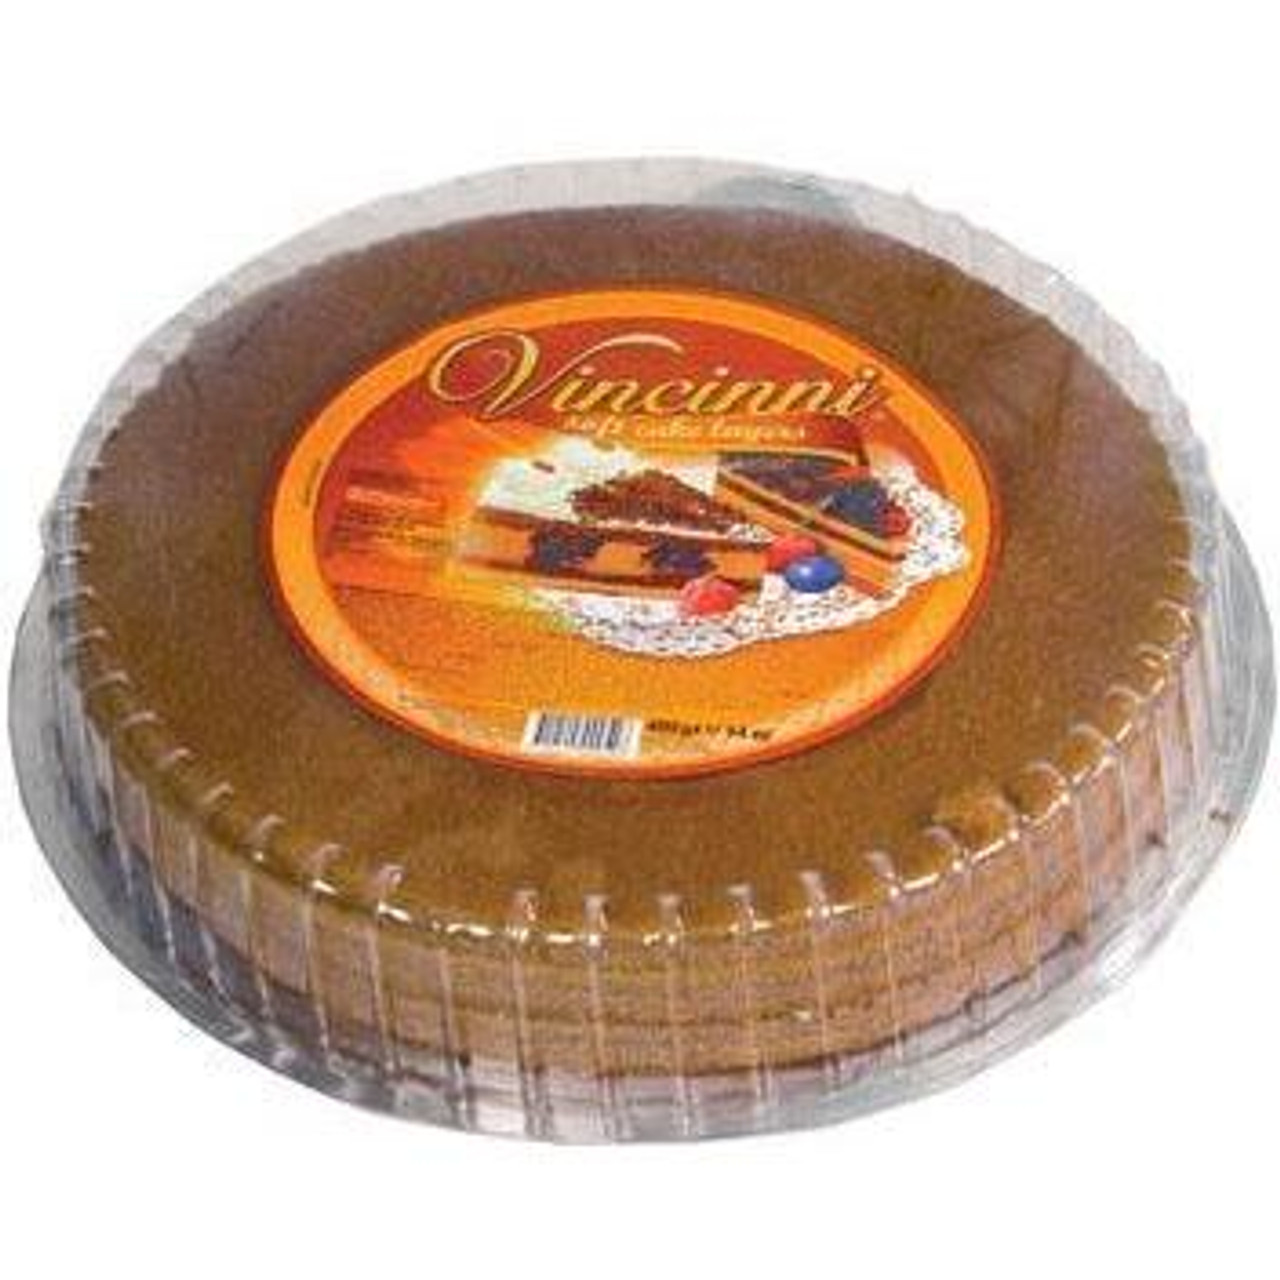 Vincinni Round Soft Cake Layer (Pre-Baked Dark w/cacao)